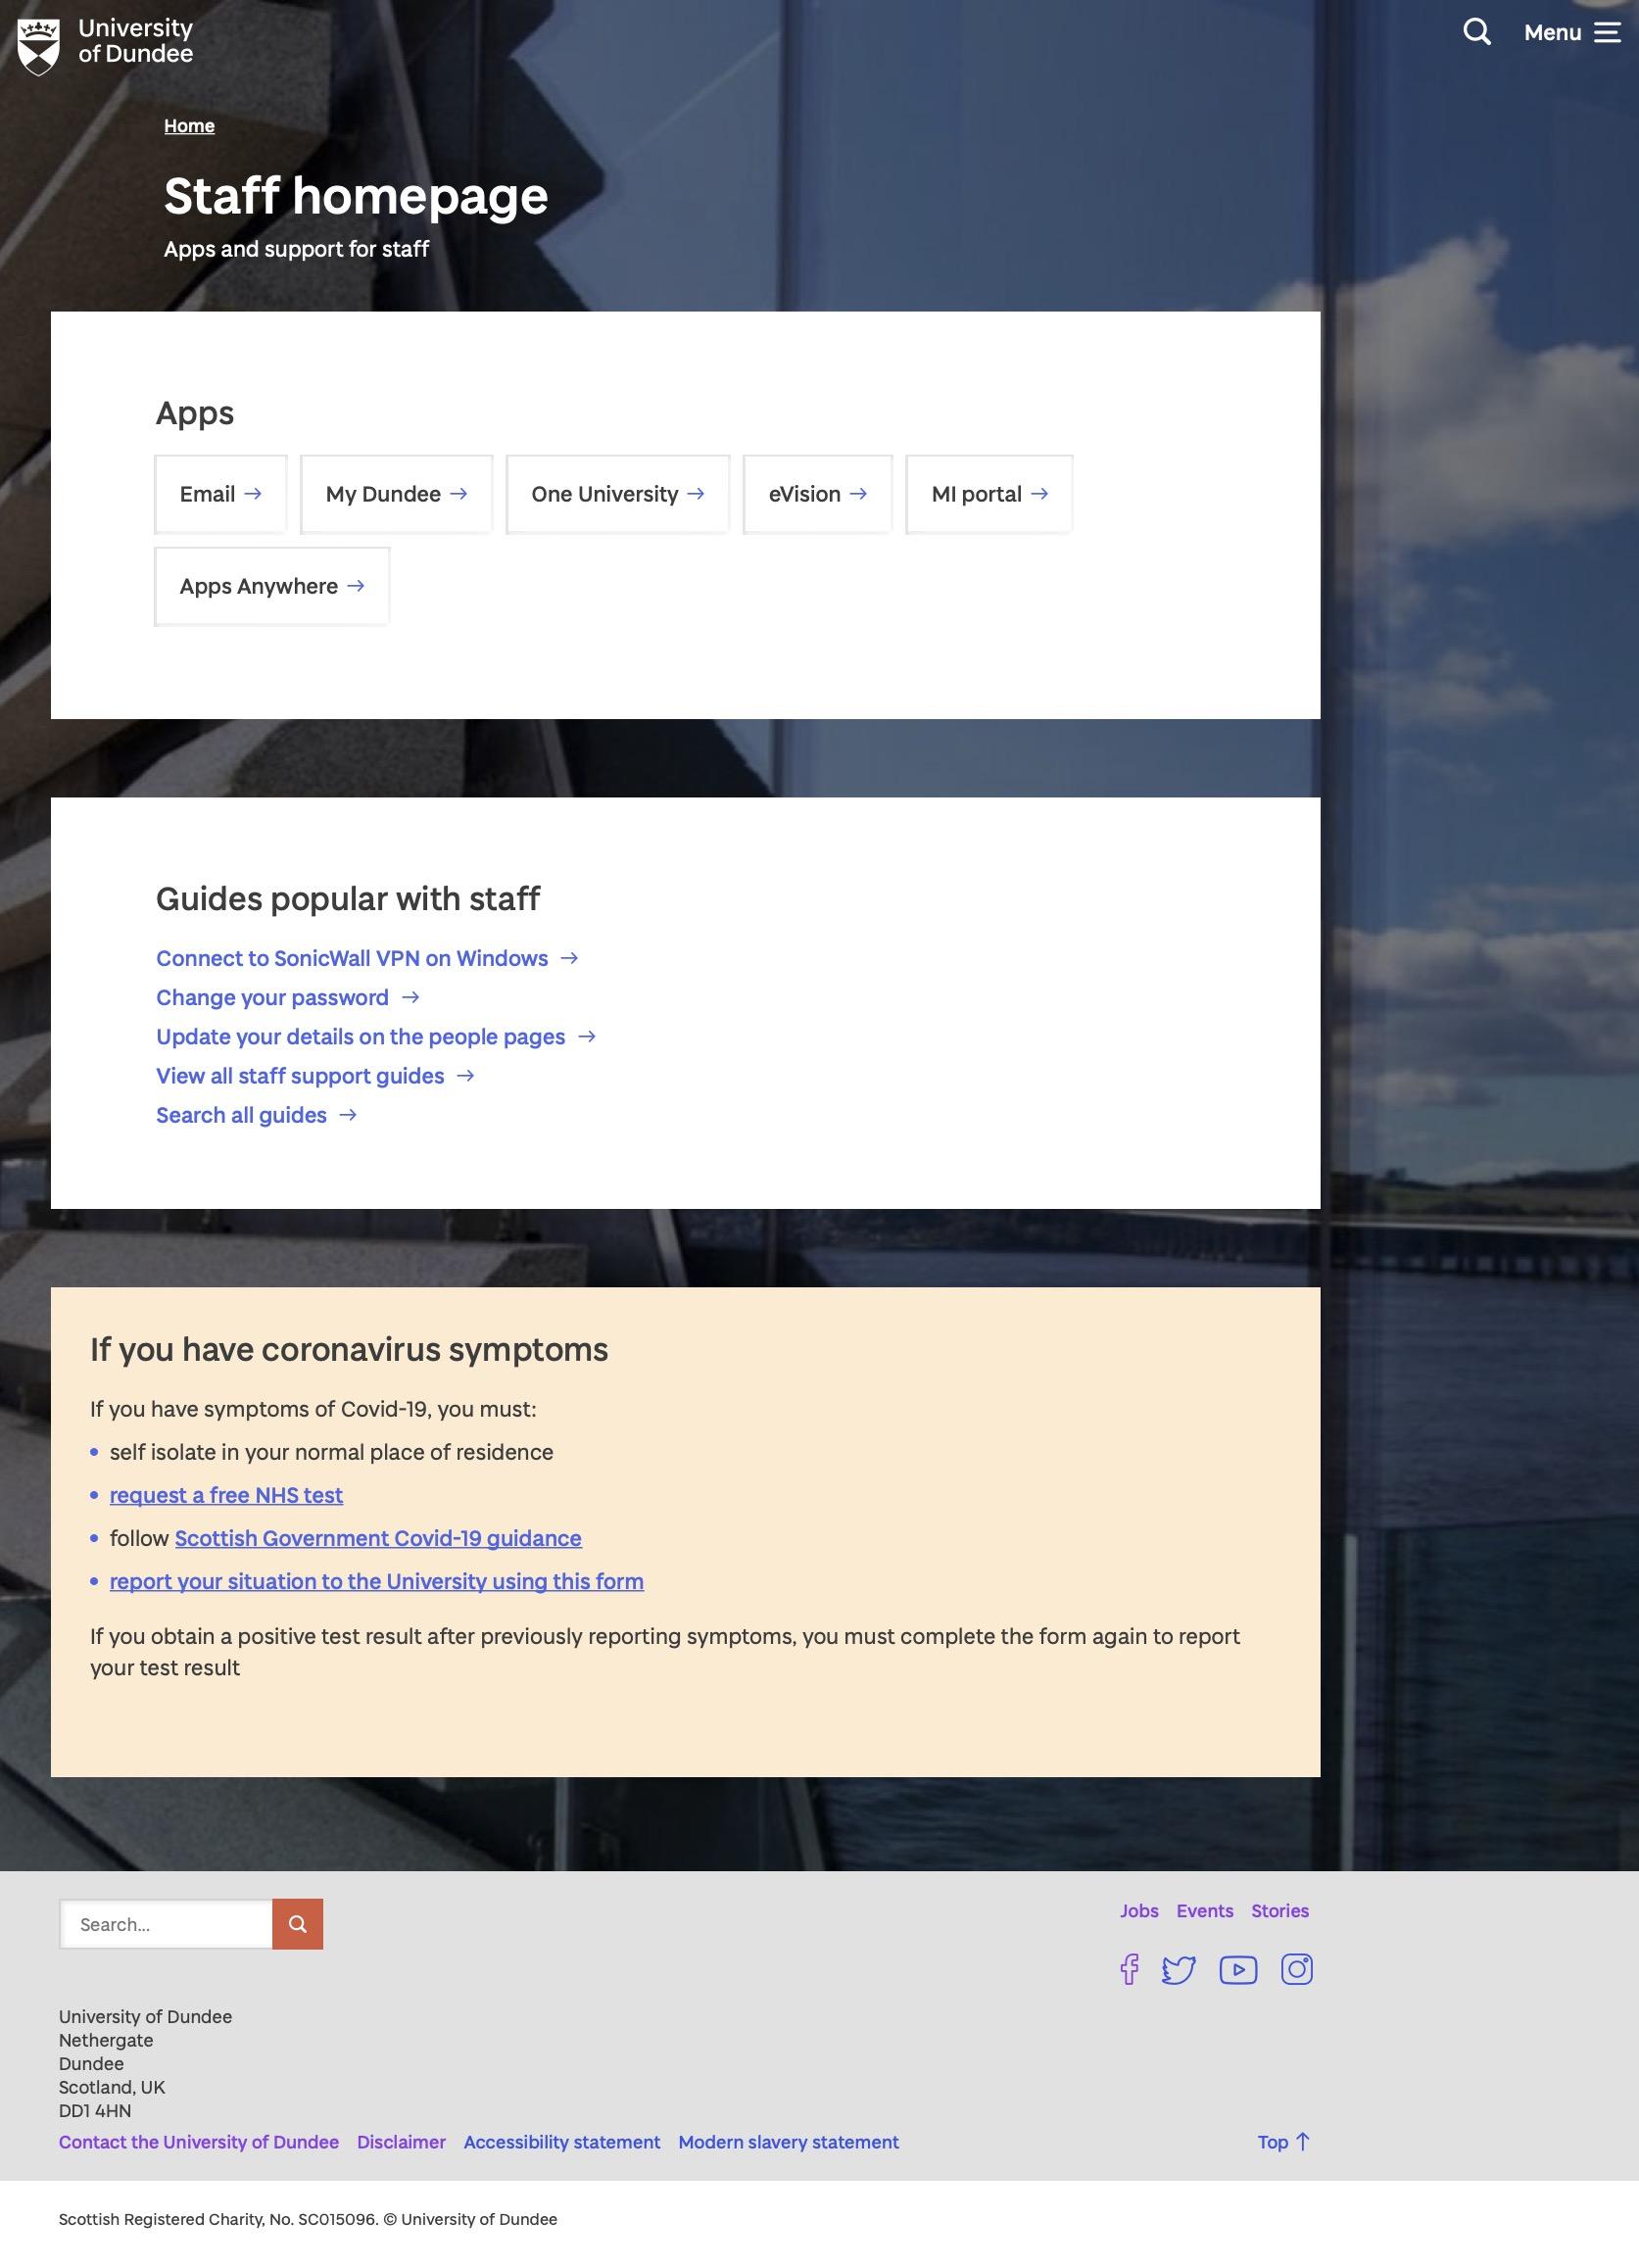 Staff homepage image